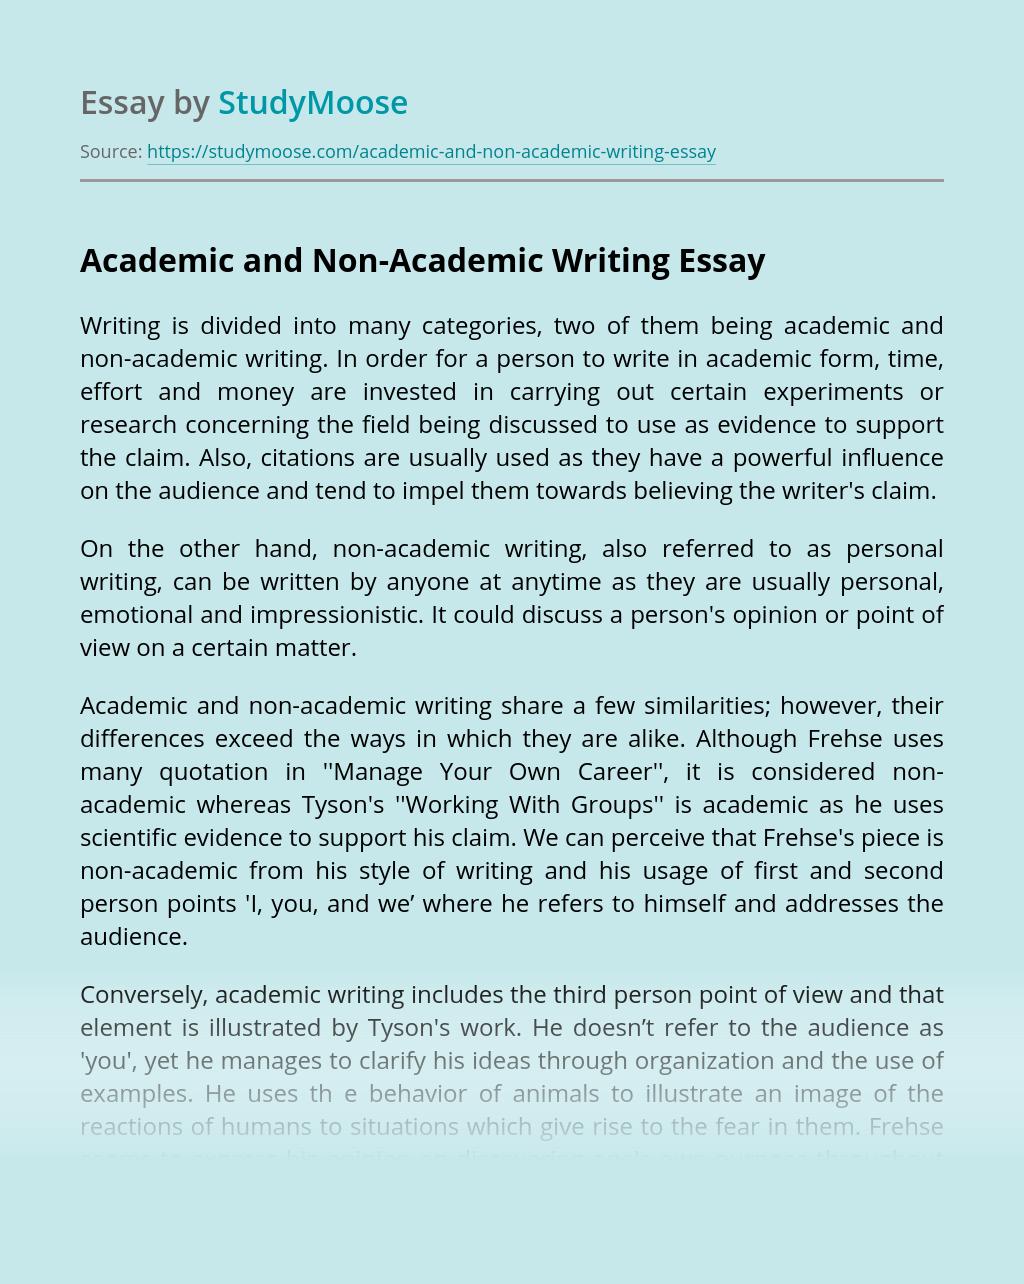 Academic and Non-Academic Writing